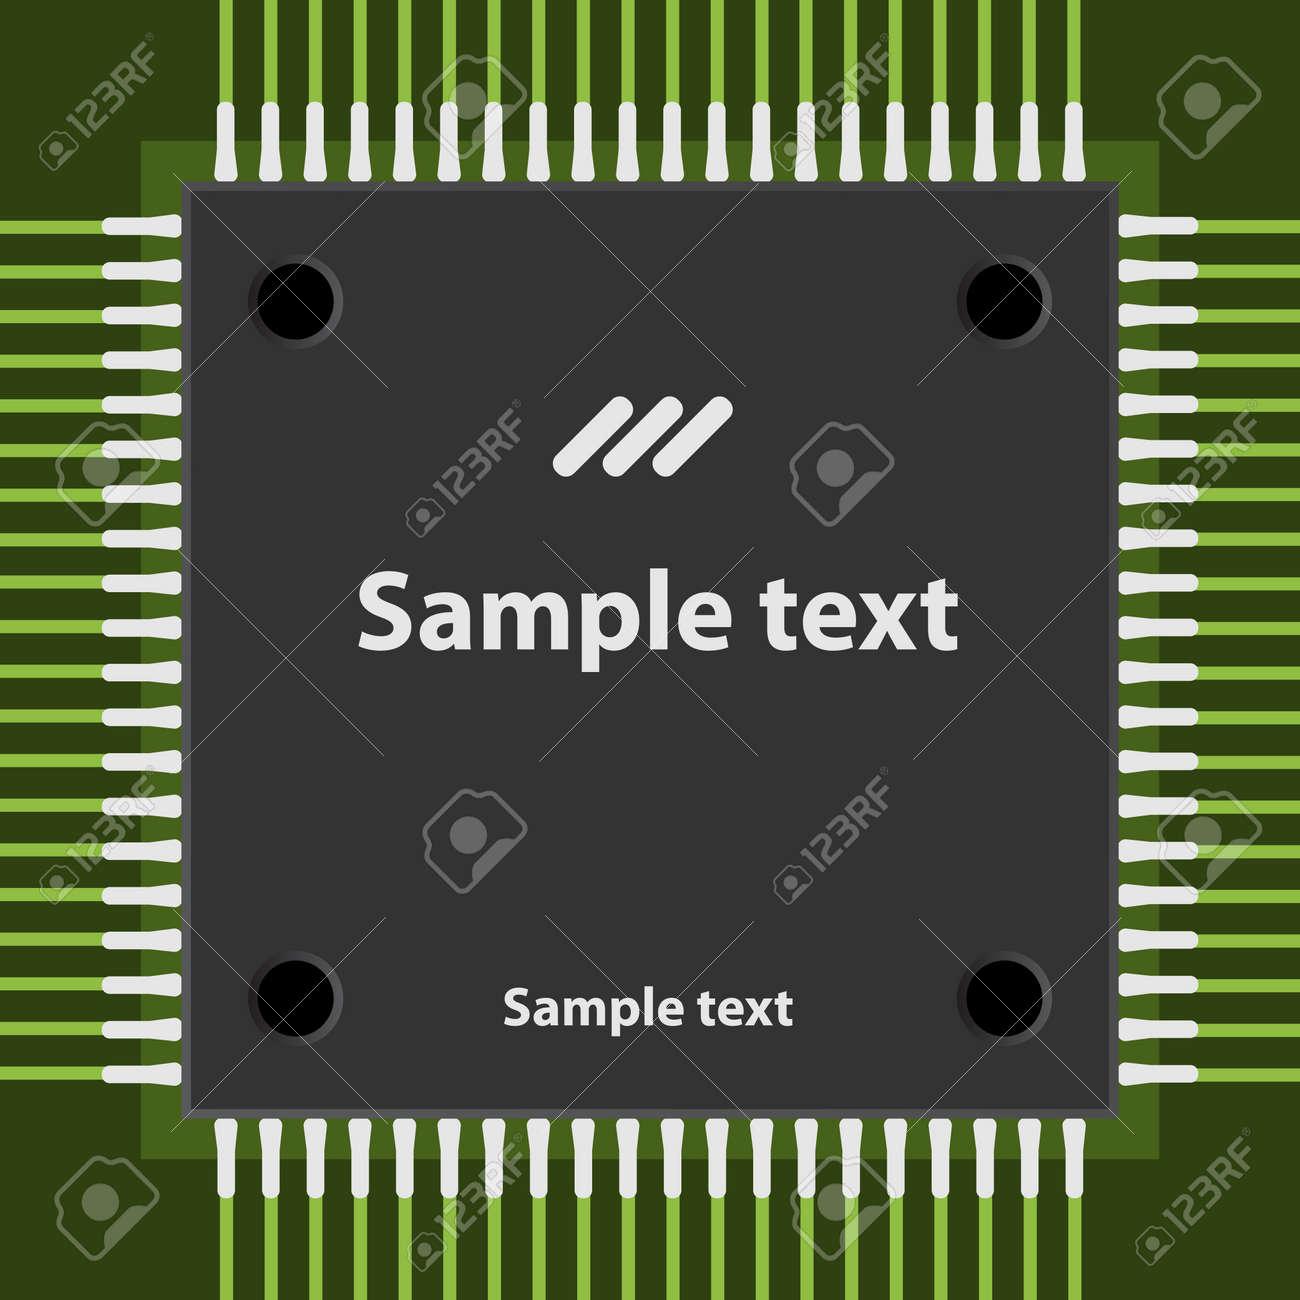 vector microchip Stock Vector - 11504243